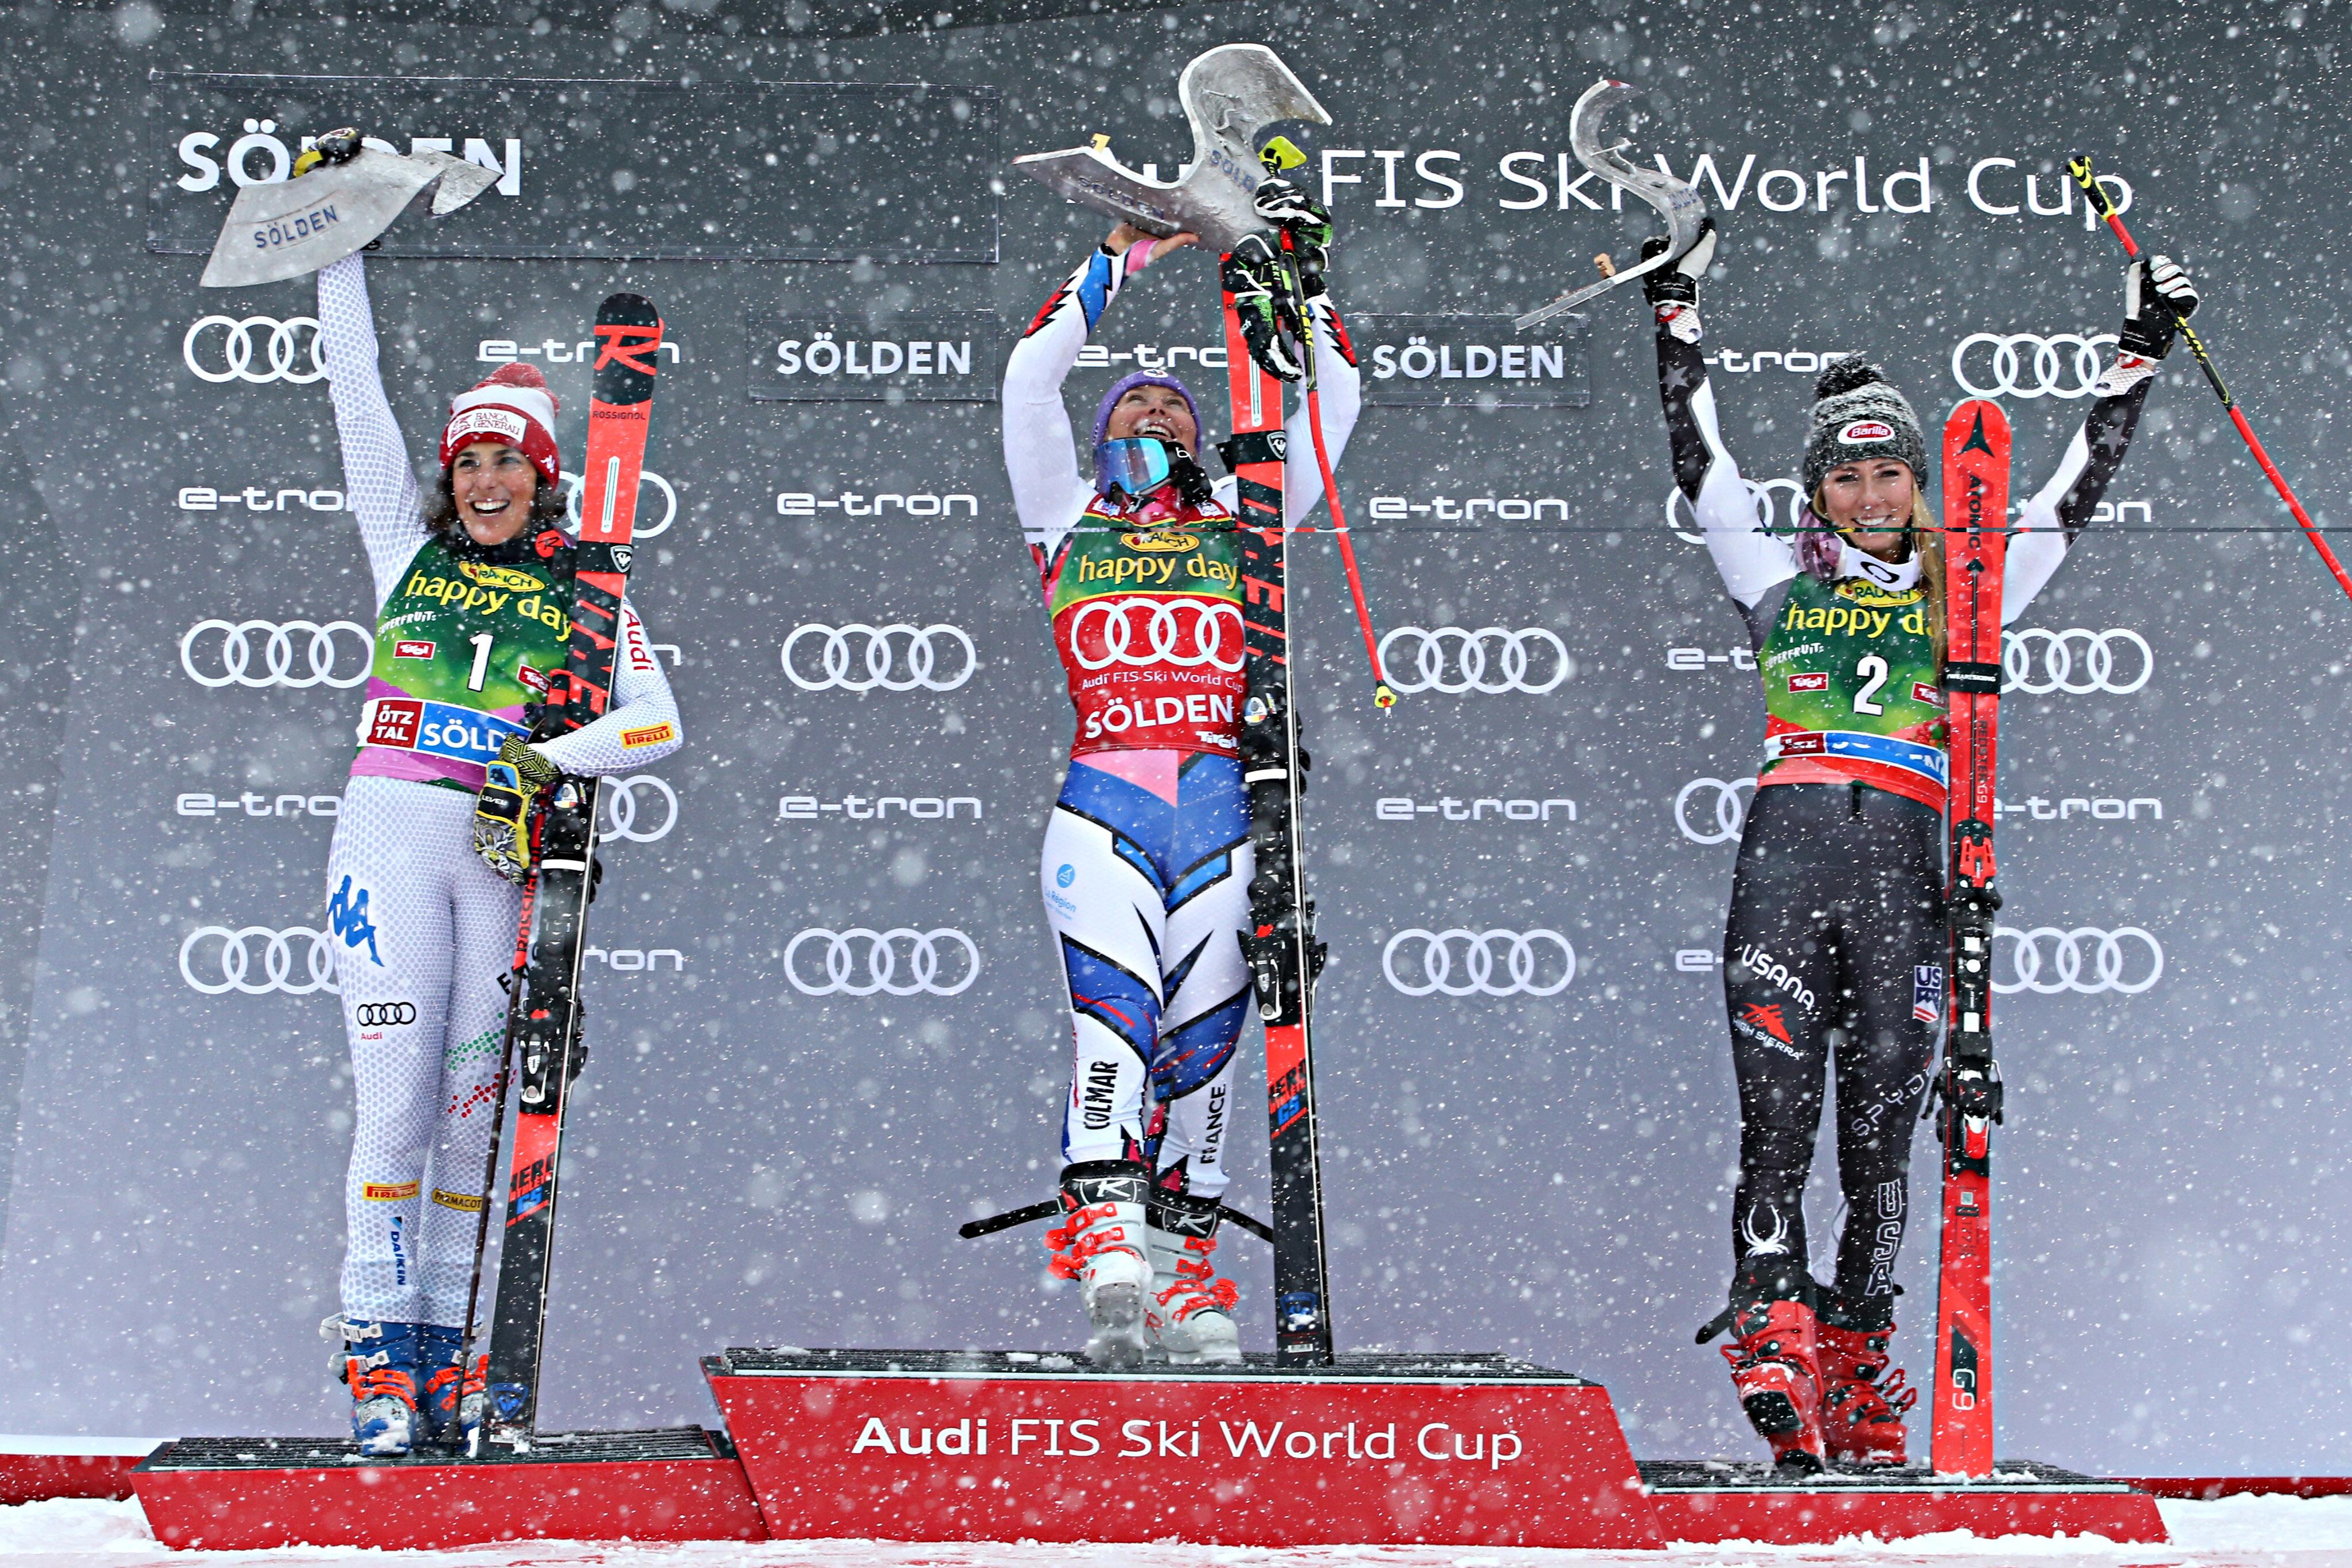 Federica Brignone, Tessa Worley et Mikaela Shiffrin